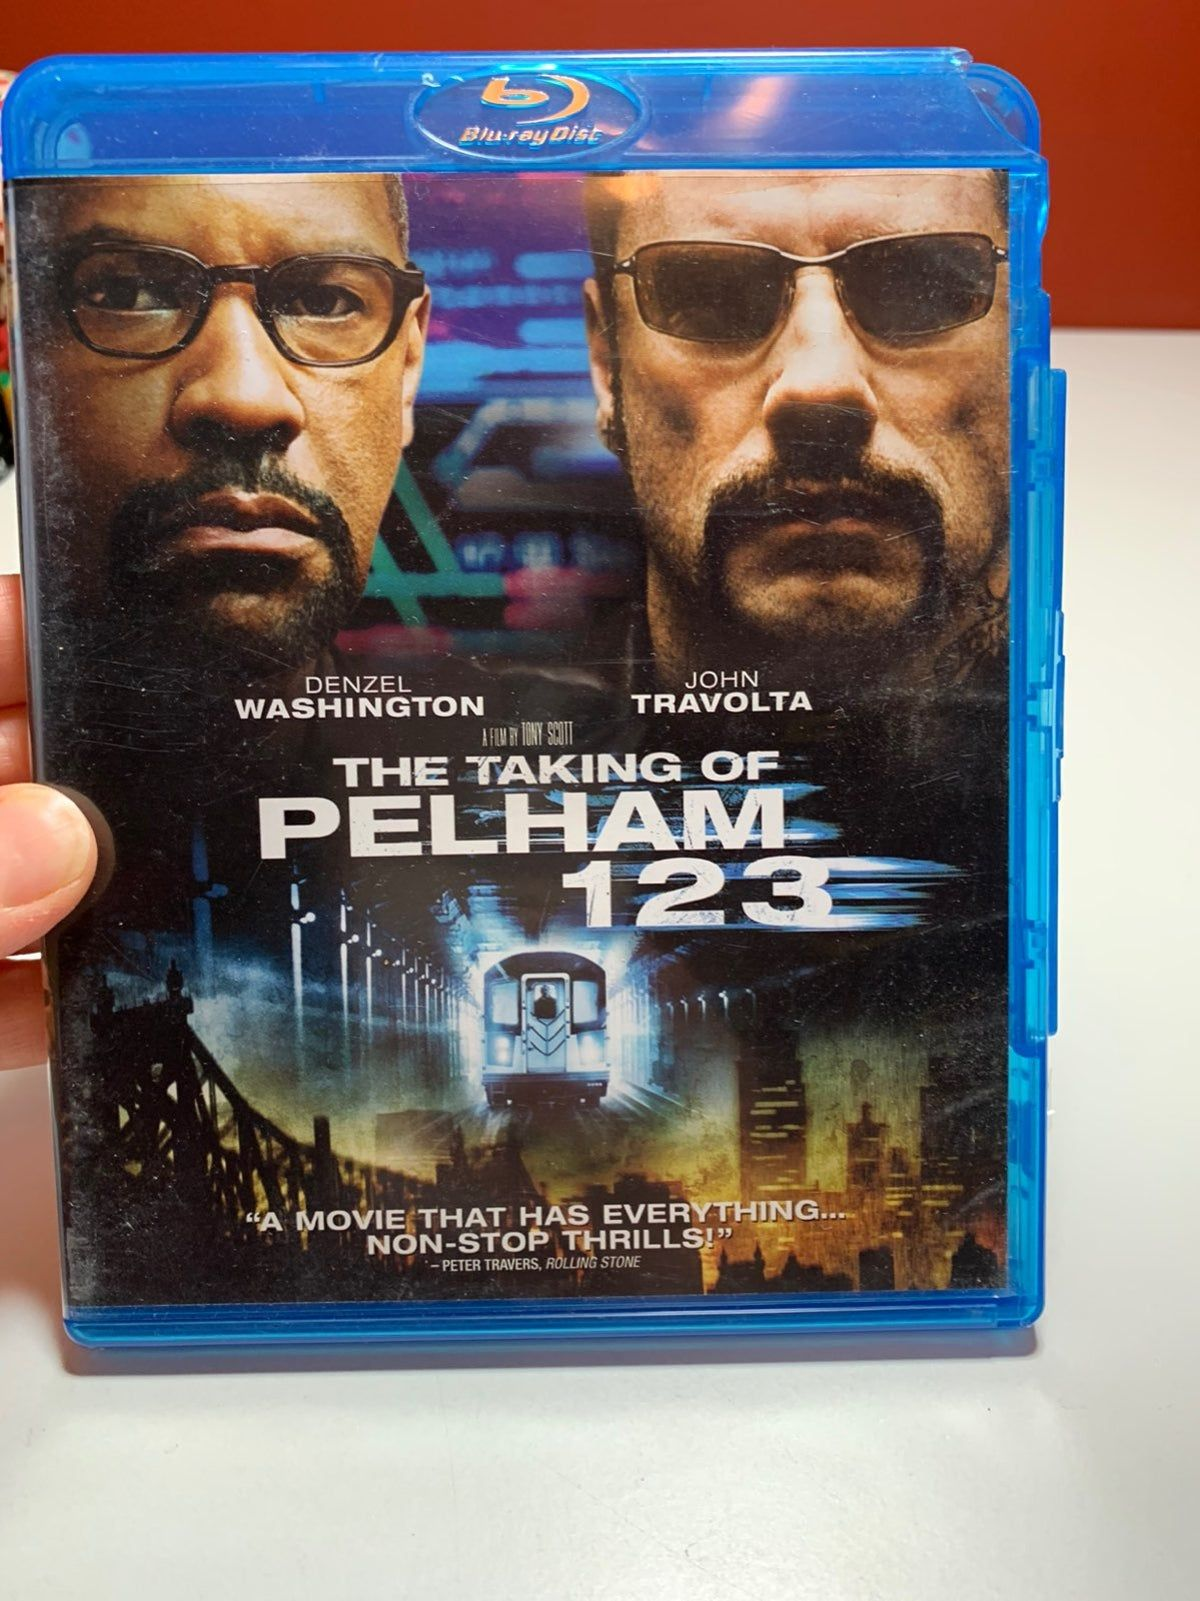 The Taking Of Pelham 123 Movie Blu Ray In 2020 Movies Blu Blu Ray